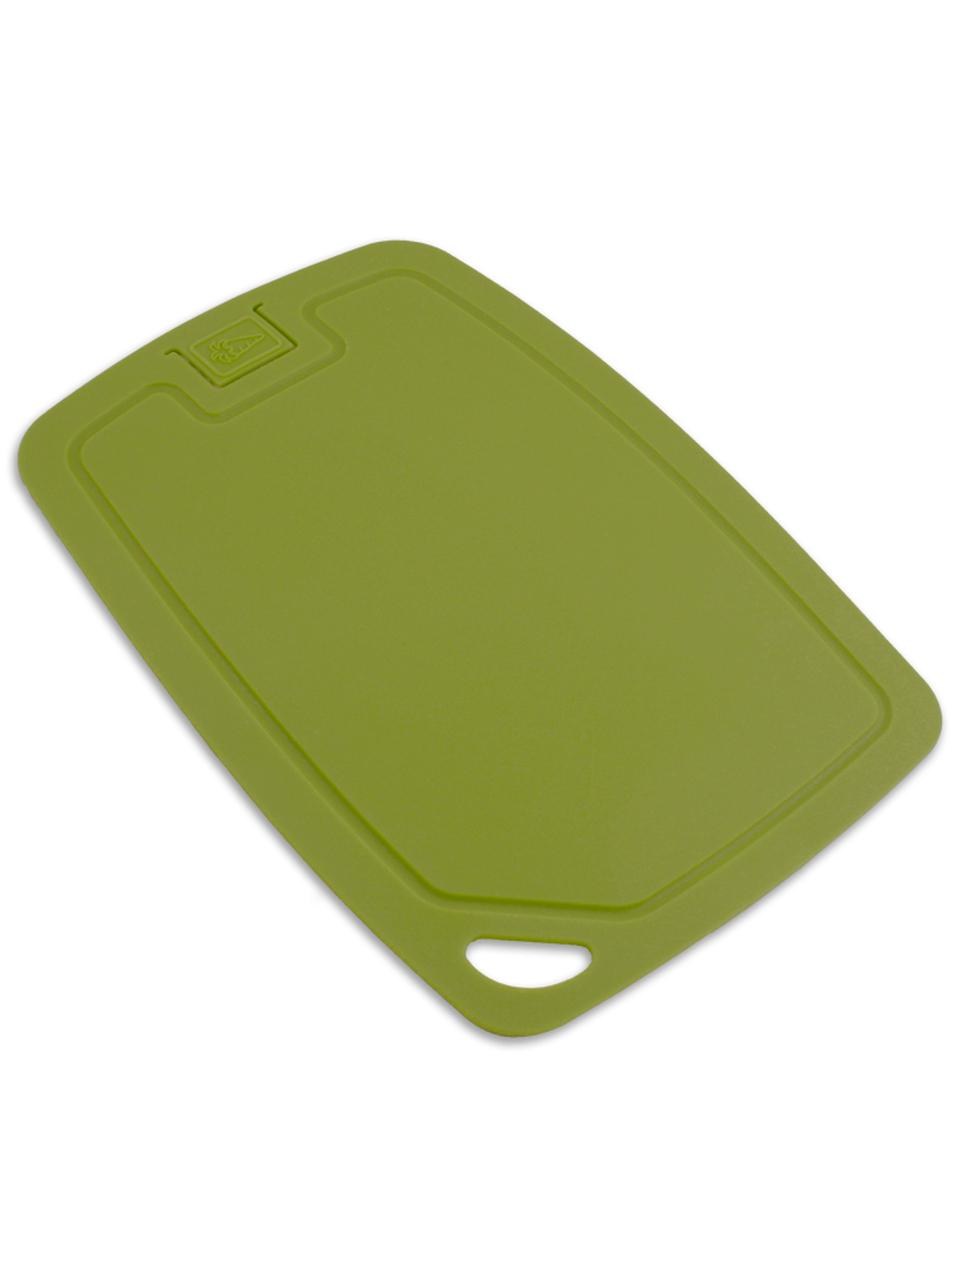 Eco Chopping Board